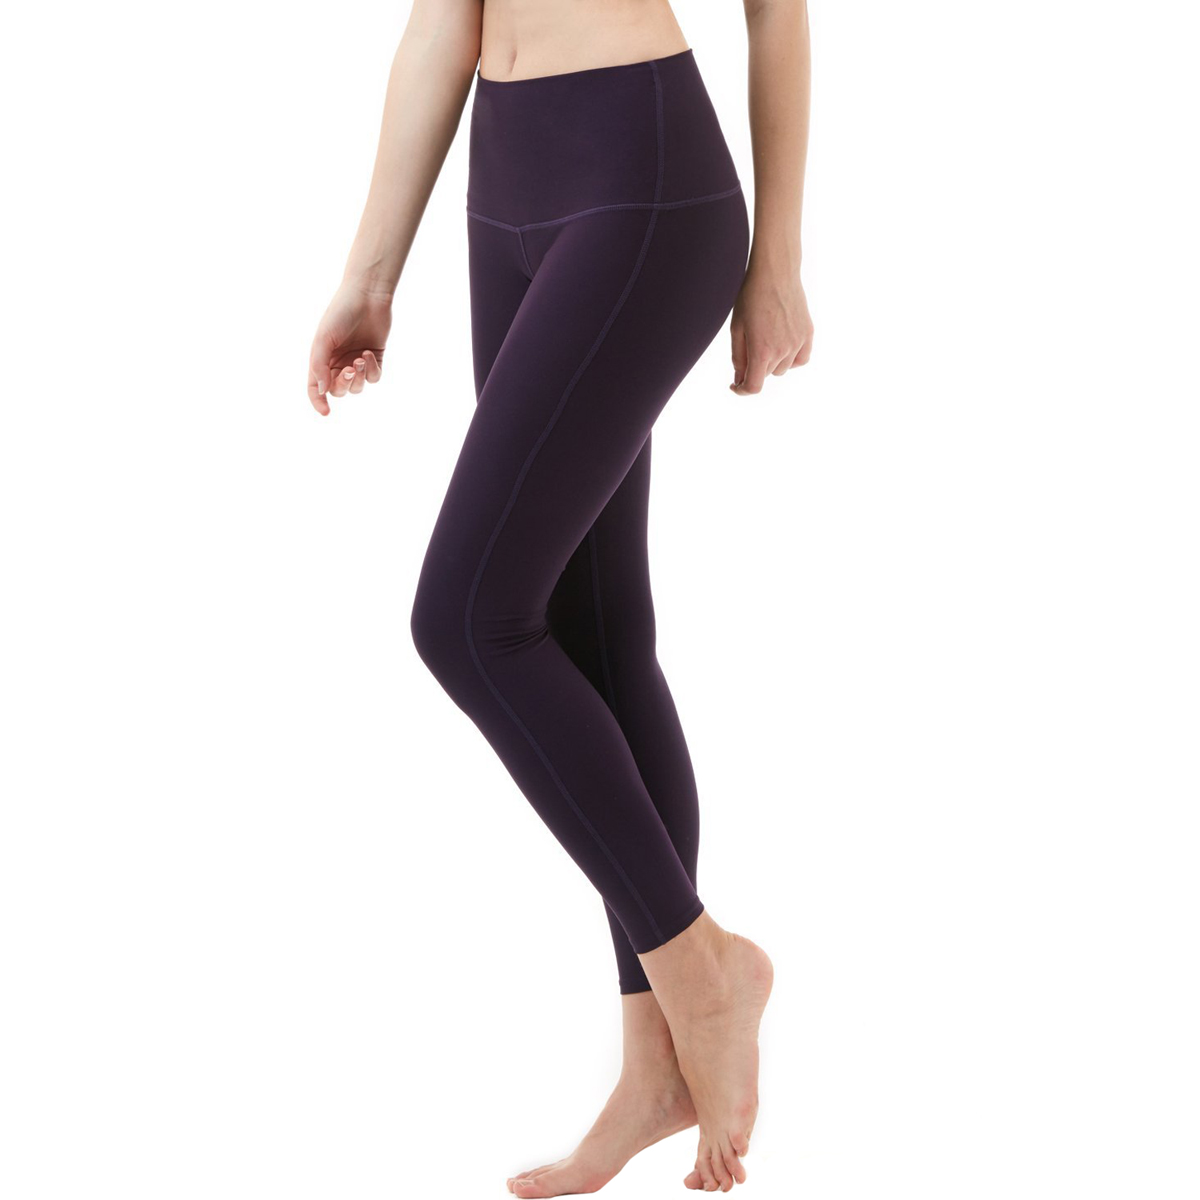 thumbnail 32 - TSLA Tesla FYP42 Women's High-Waisted Ultra-Stretch Tummy Control Yoga Pants